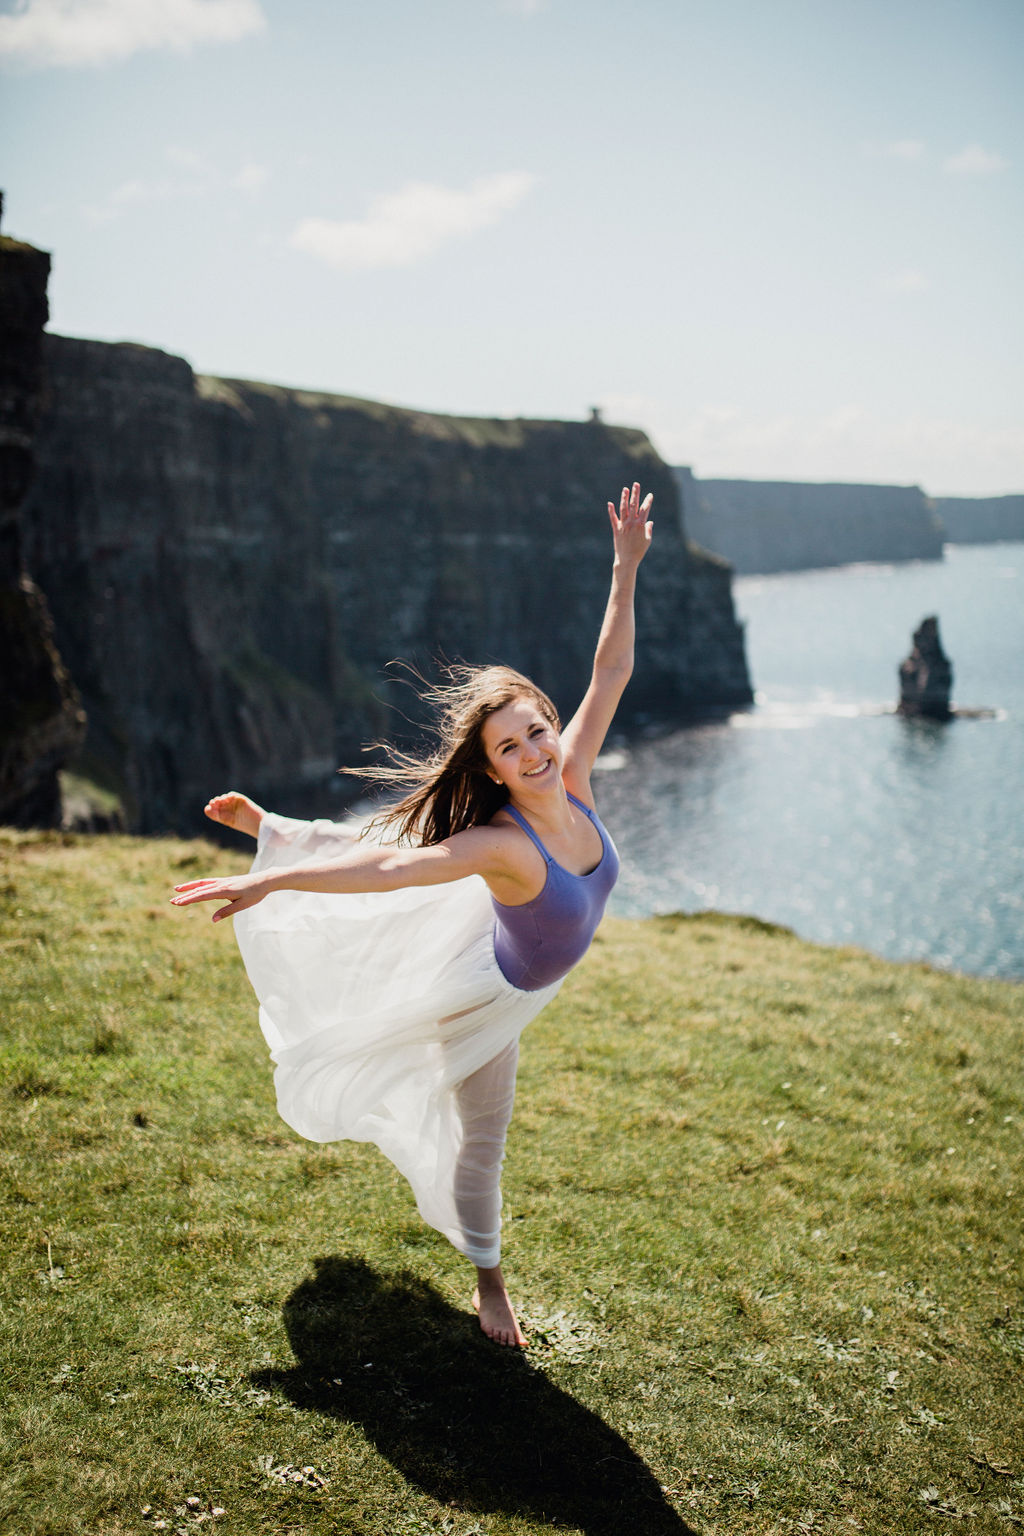 ireland studio rachel desjardins travel photography all rights reserved minnesota photographer lizcannor doolin cliffs of moher  dance dancing dancer modern ballet erin campagna